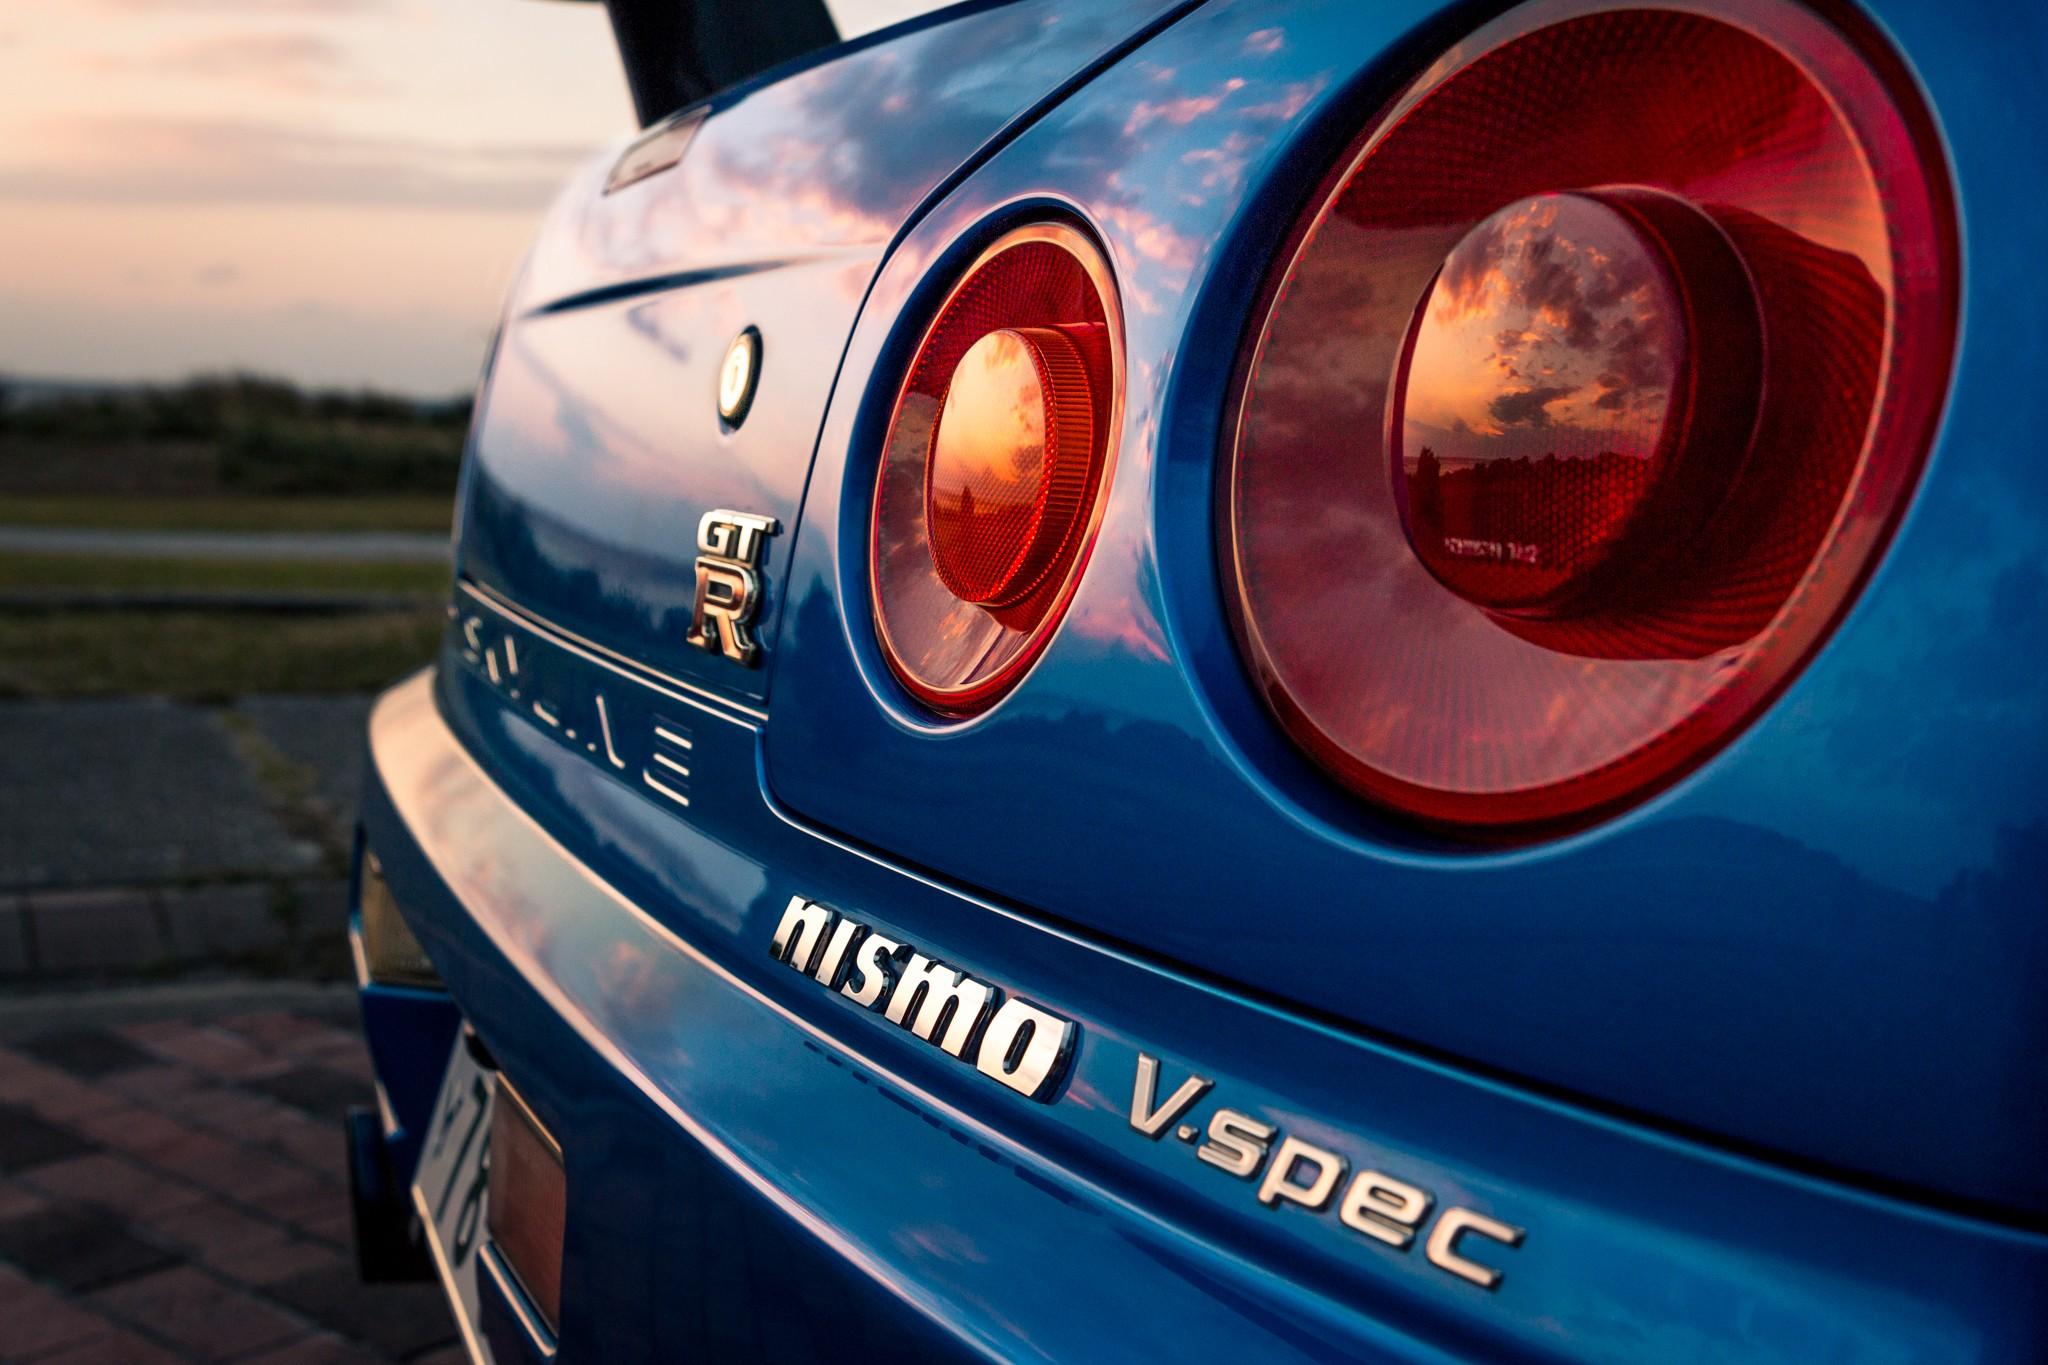 Wallpaper 2048x1365 Px Blue Car Jdm Nismo Nissan